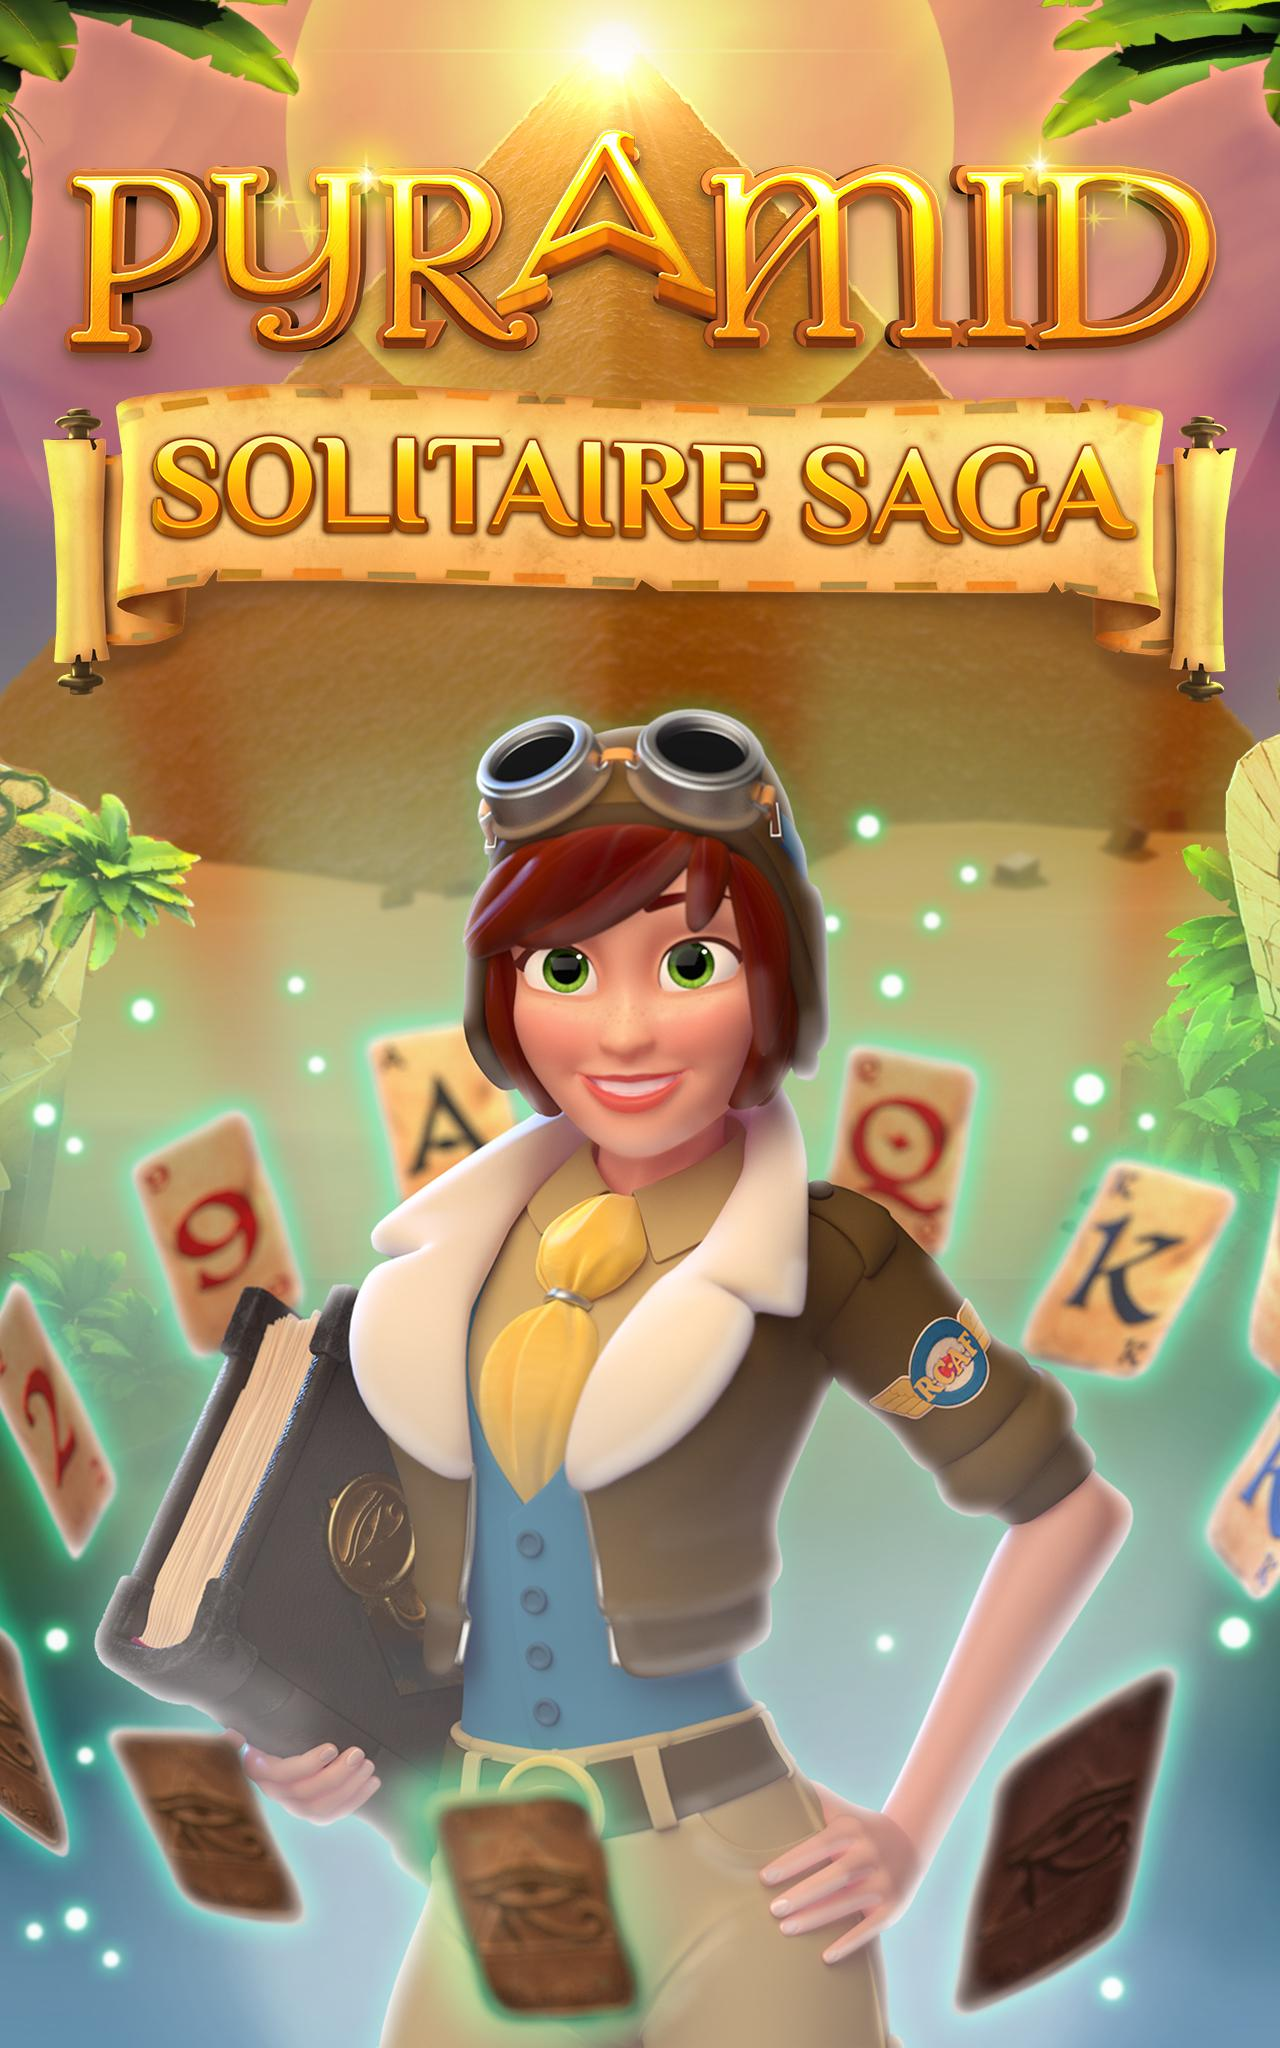 Pyramid Solitaire Saga screenshot #12